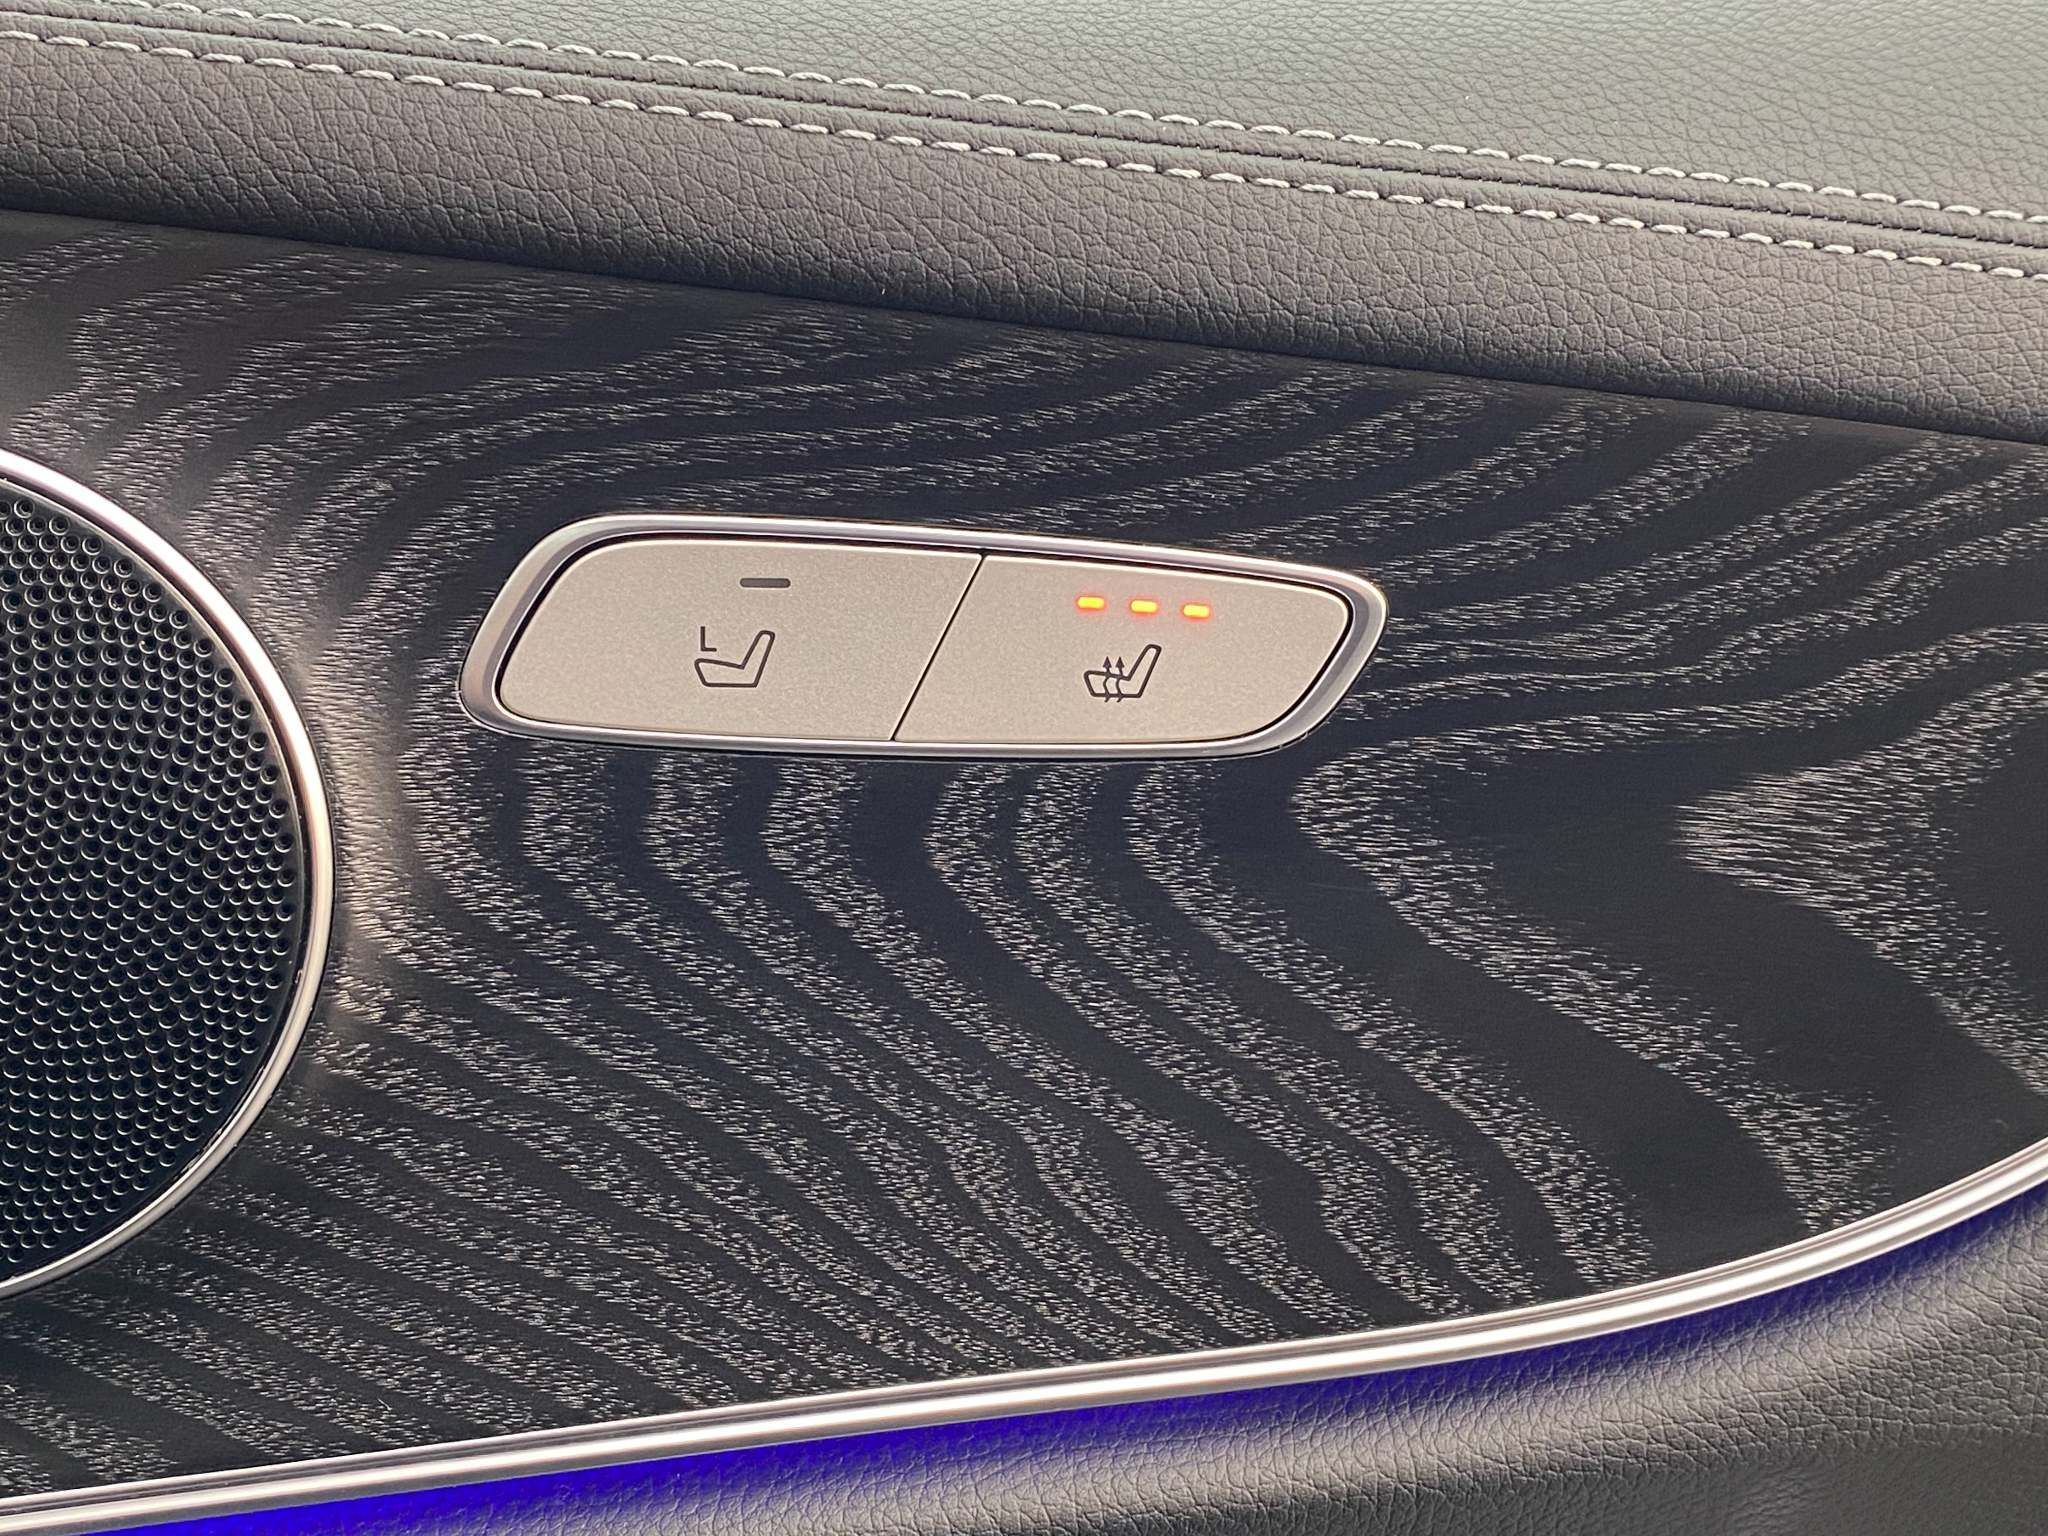 2017 Mercedes-Benz E Class 2.0 E220d AMG Line G-Tronic+ (s/s) 2dr Diesel Automatic – Moyway Motors Dungannon full